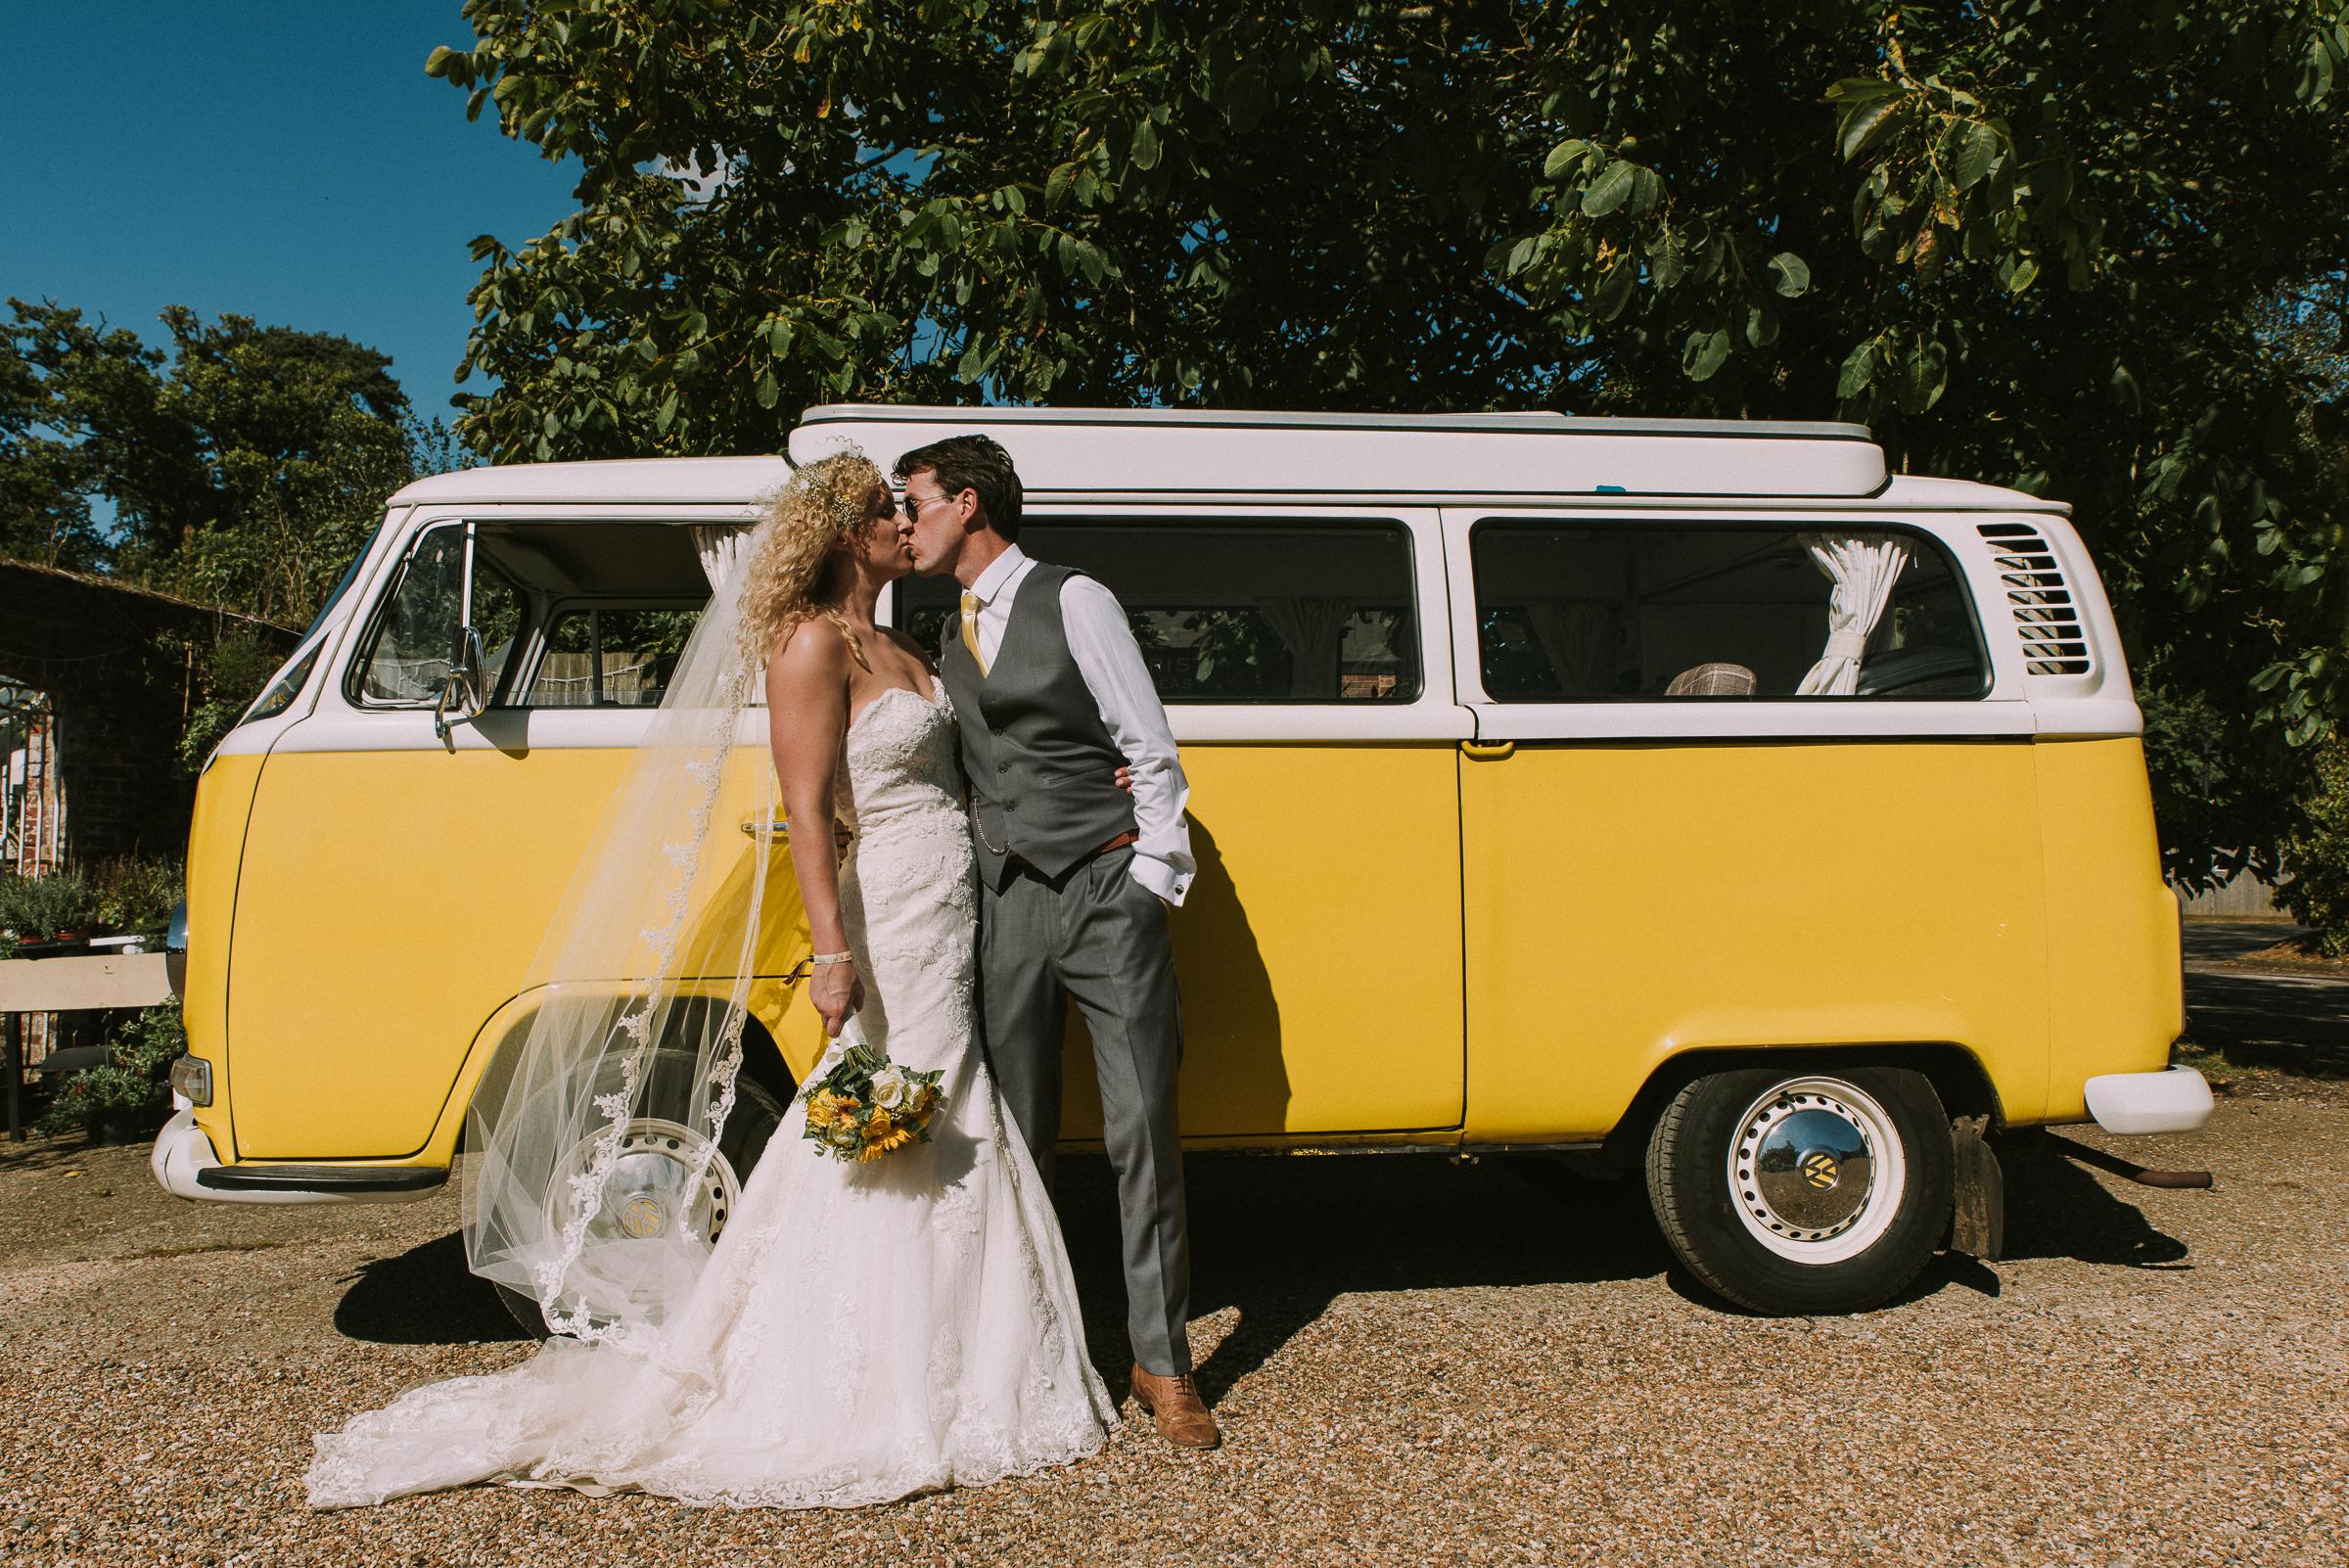 Festival Wedding Photography Secret Garden Maidstone Kent Jay Tunbridge Photorgaphic Co-39.jpg